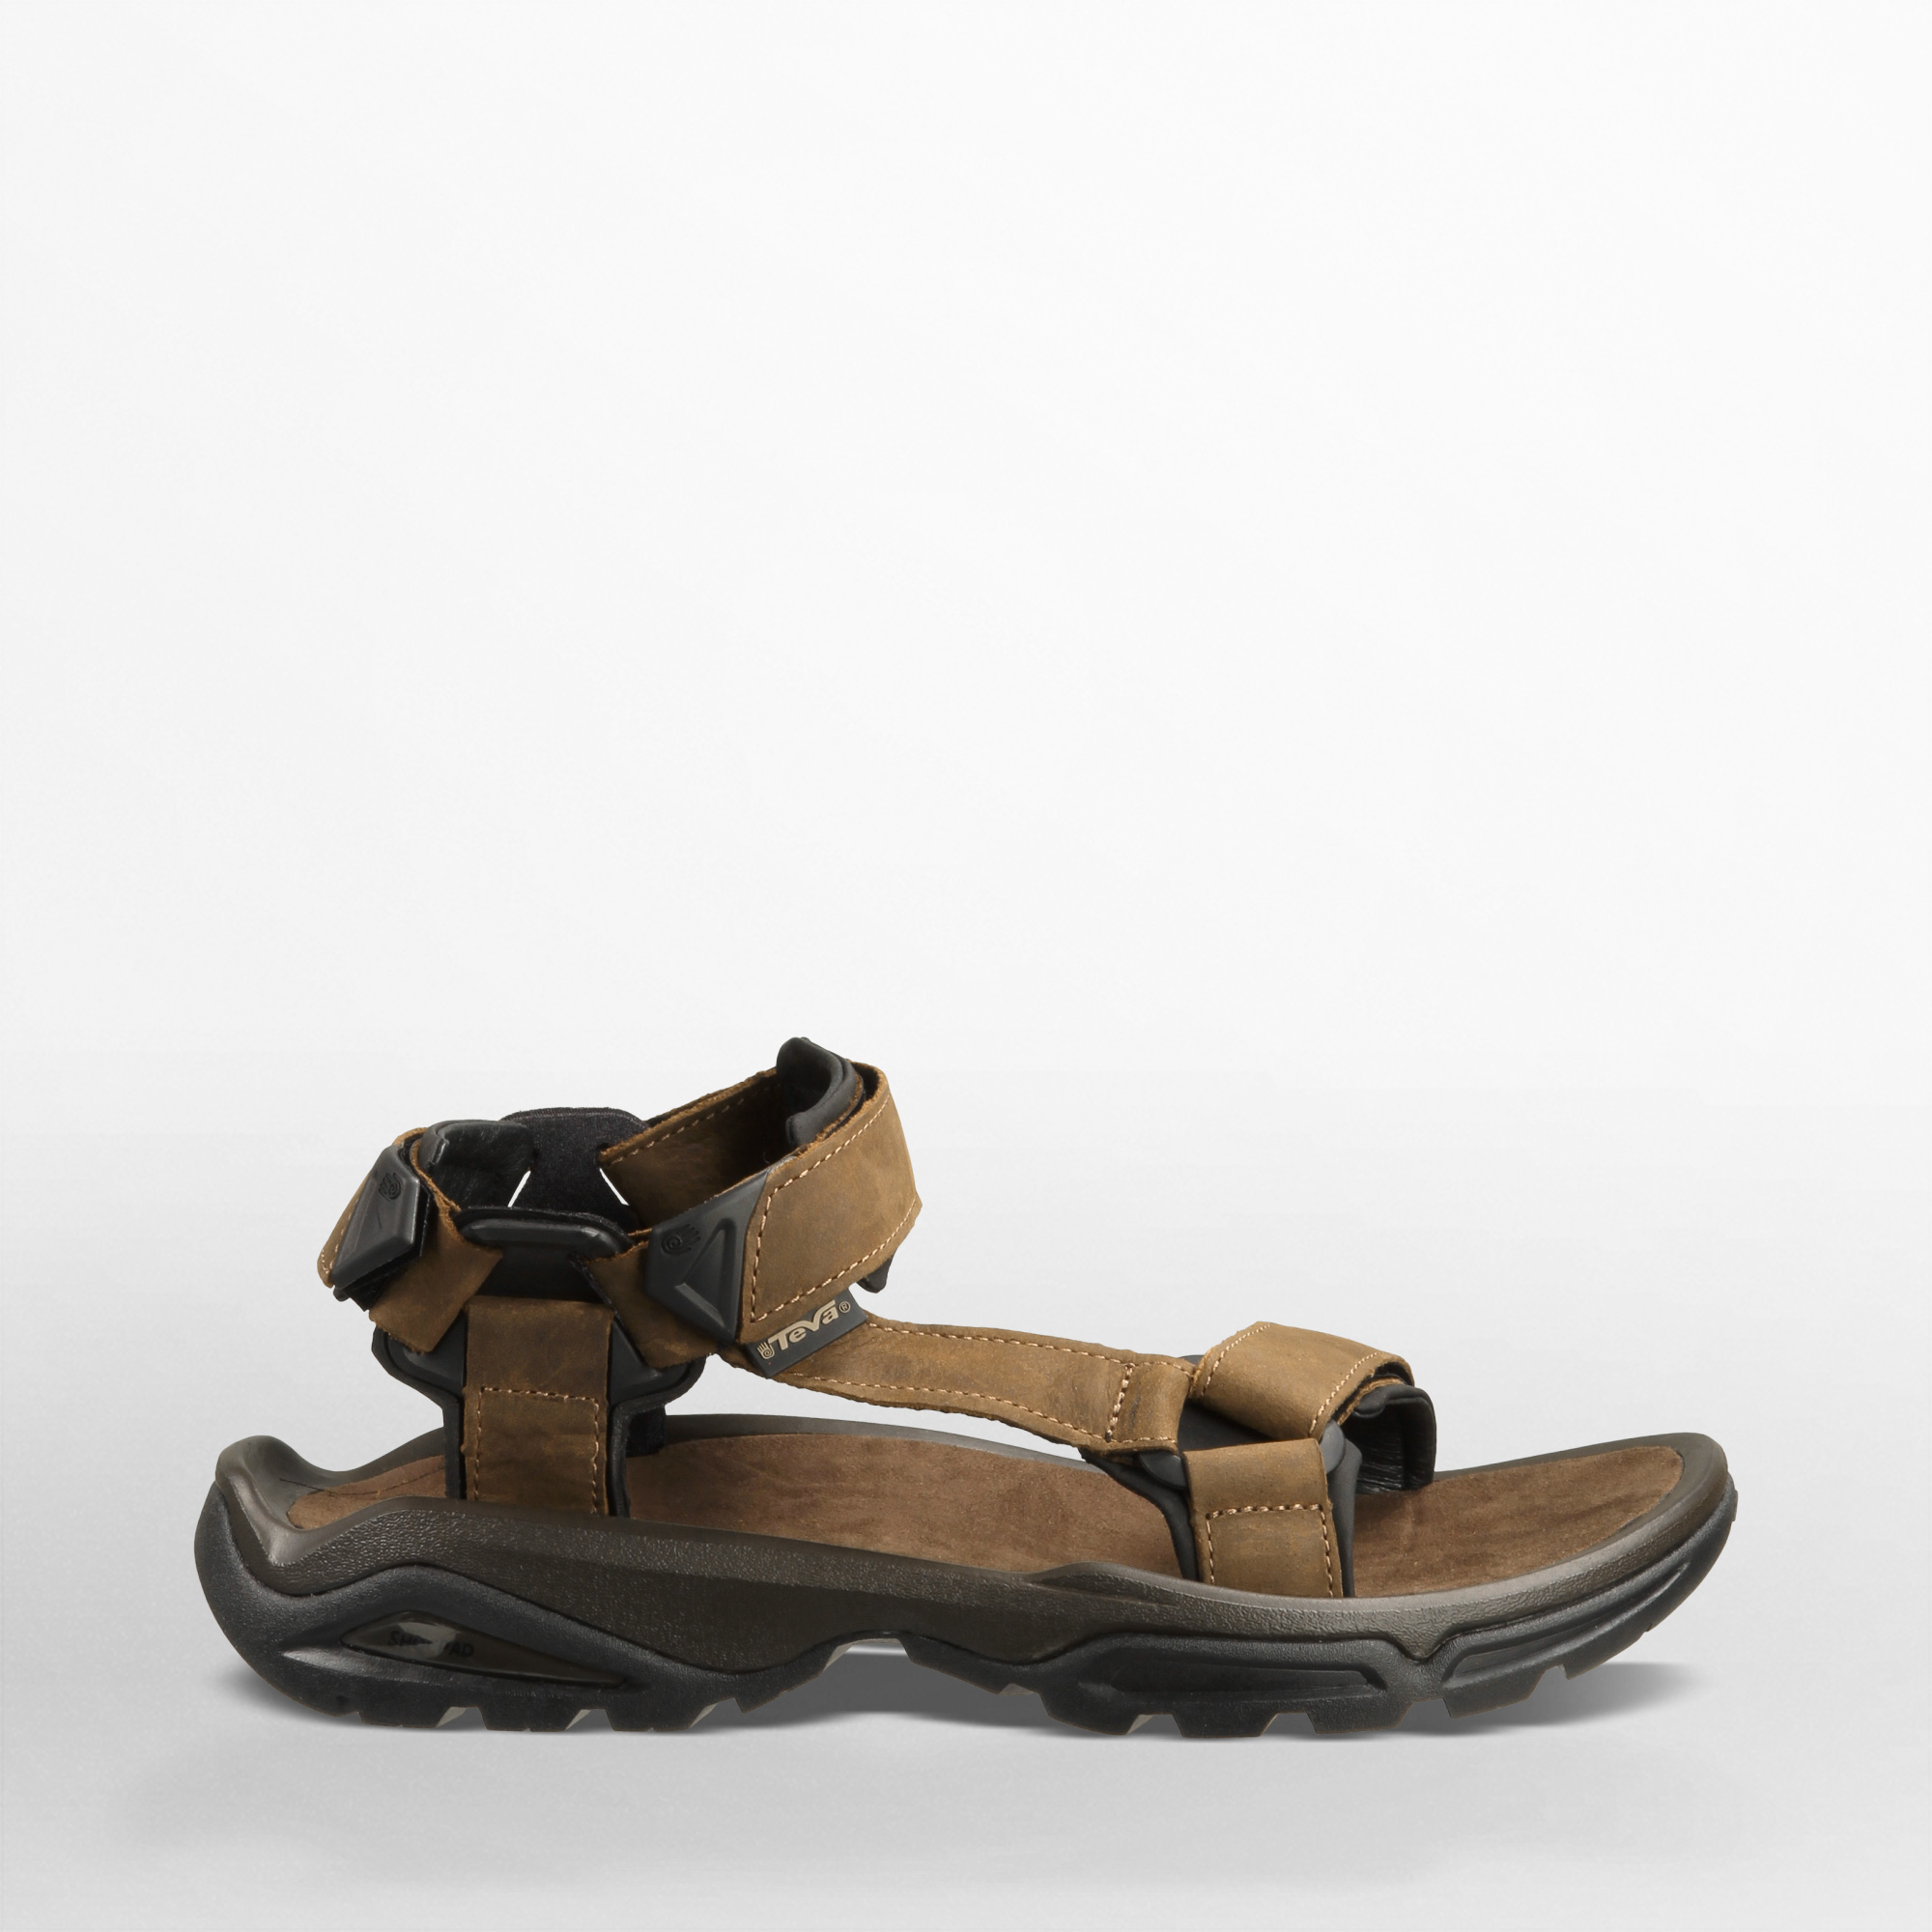 TEVA Terra Fi 4 Leather 1006251 BIS EUR 42